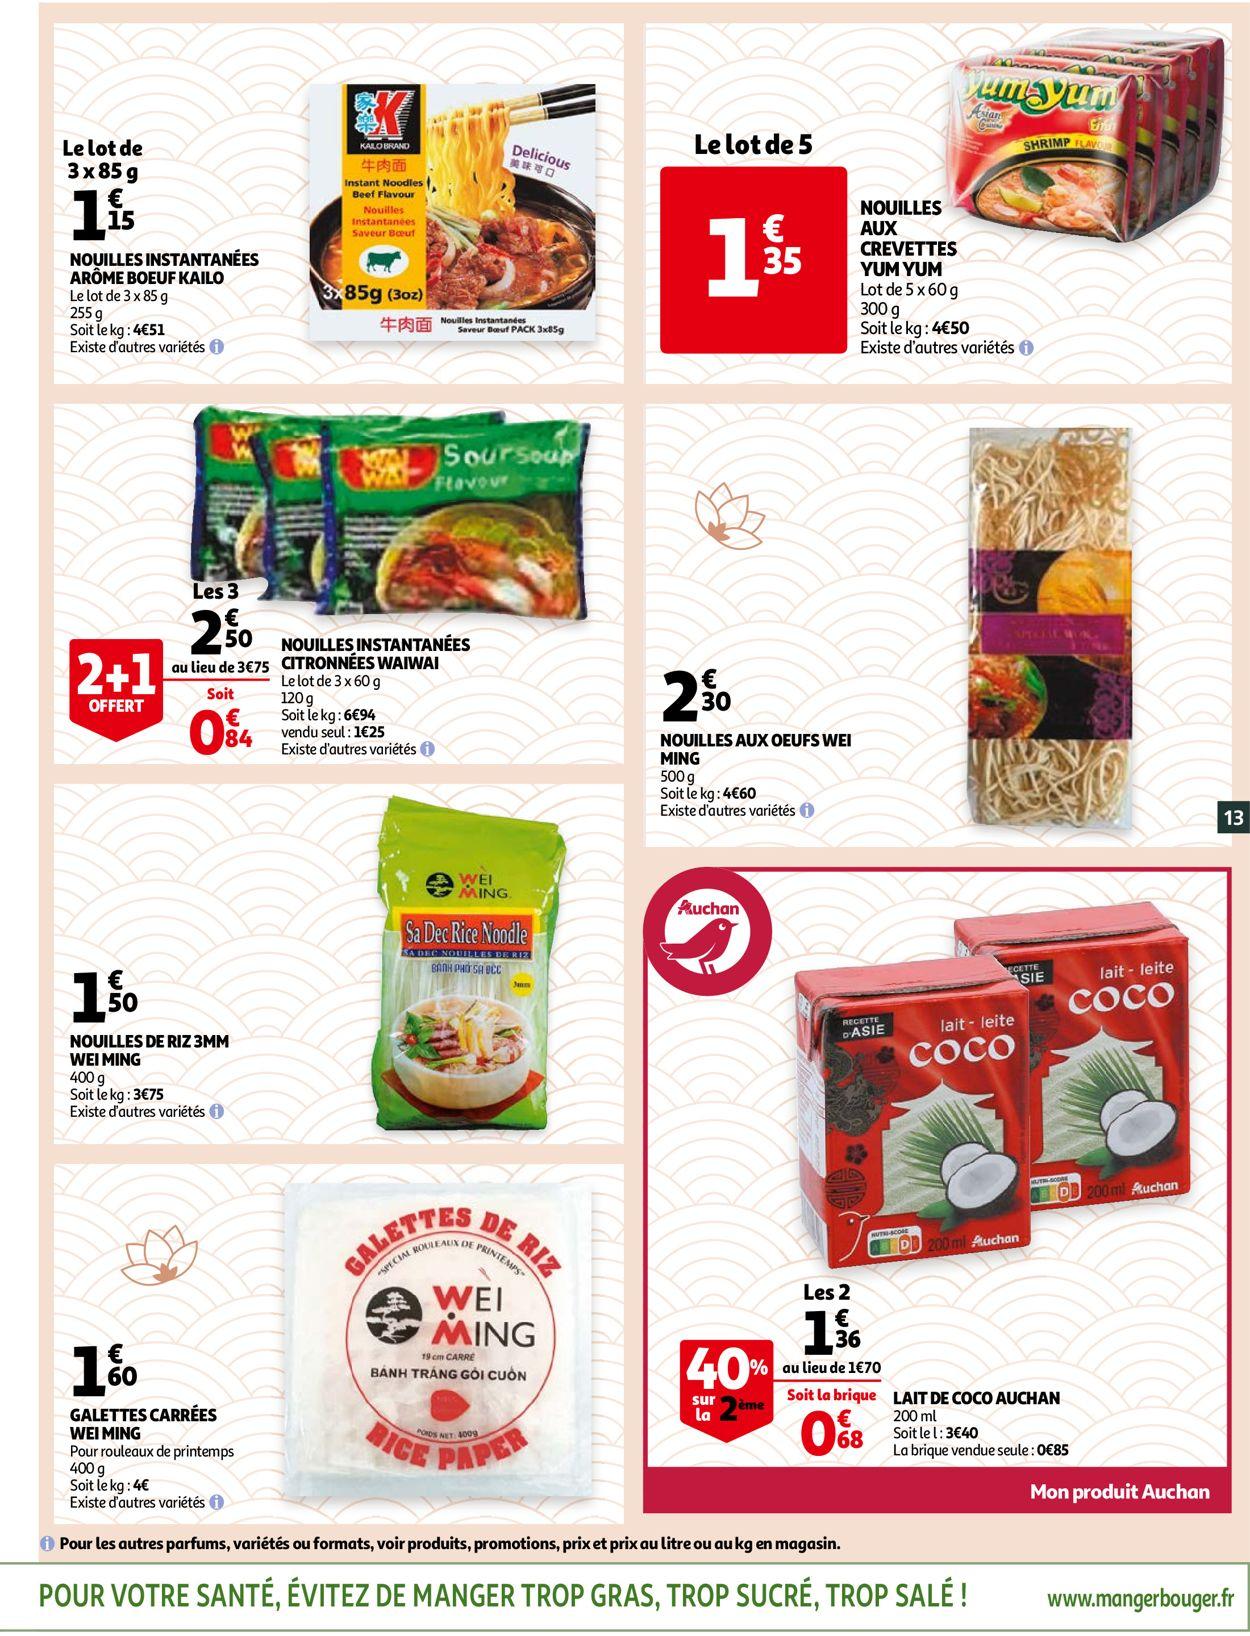 Auchan Catalogue - 03.02-14.02.2021 (Page 13)